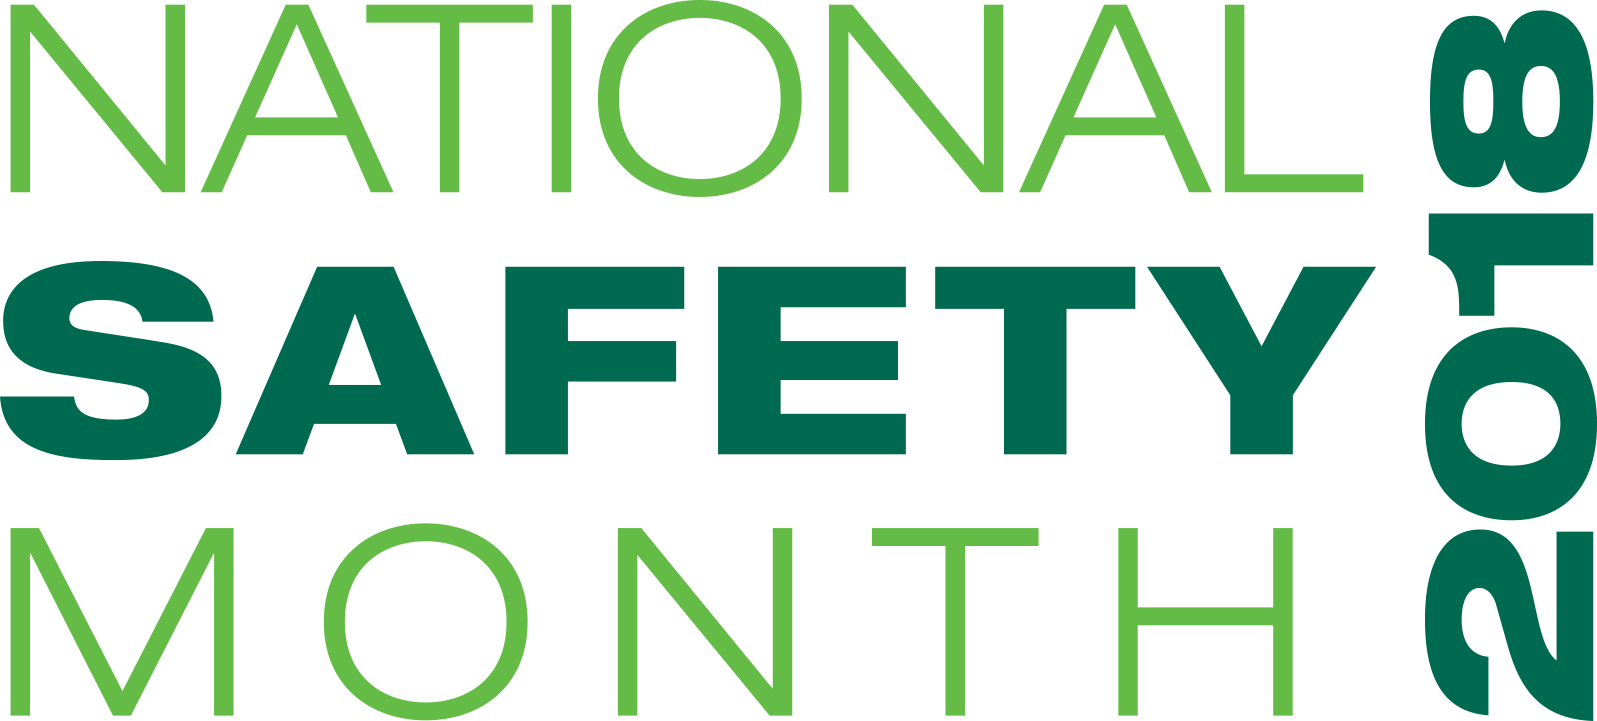 National-Safety-Month-Logo-NSC-2018.jpg